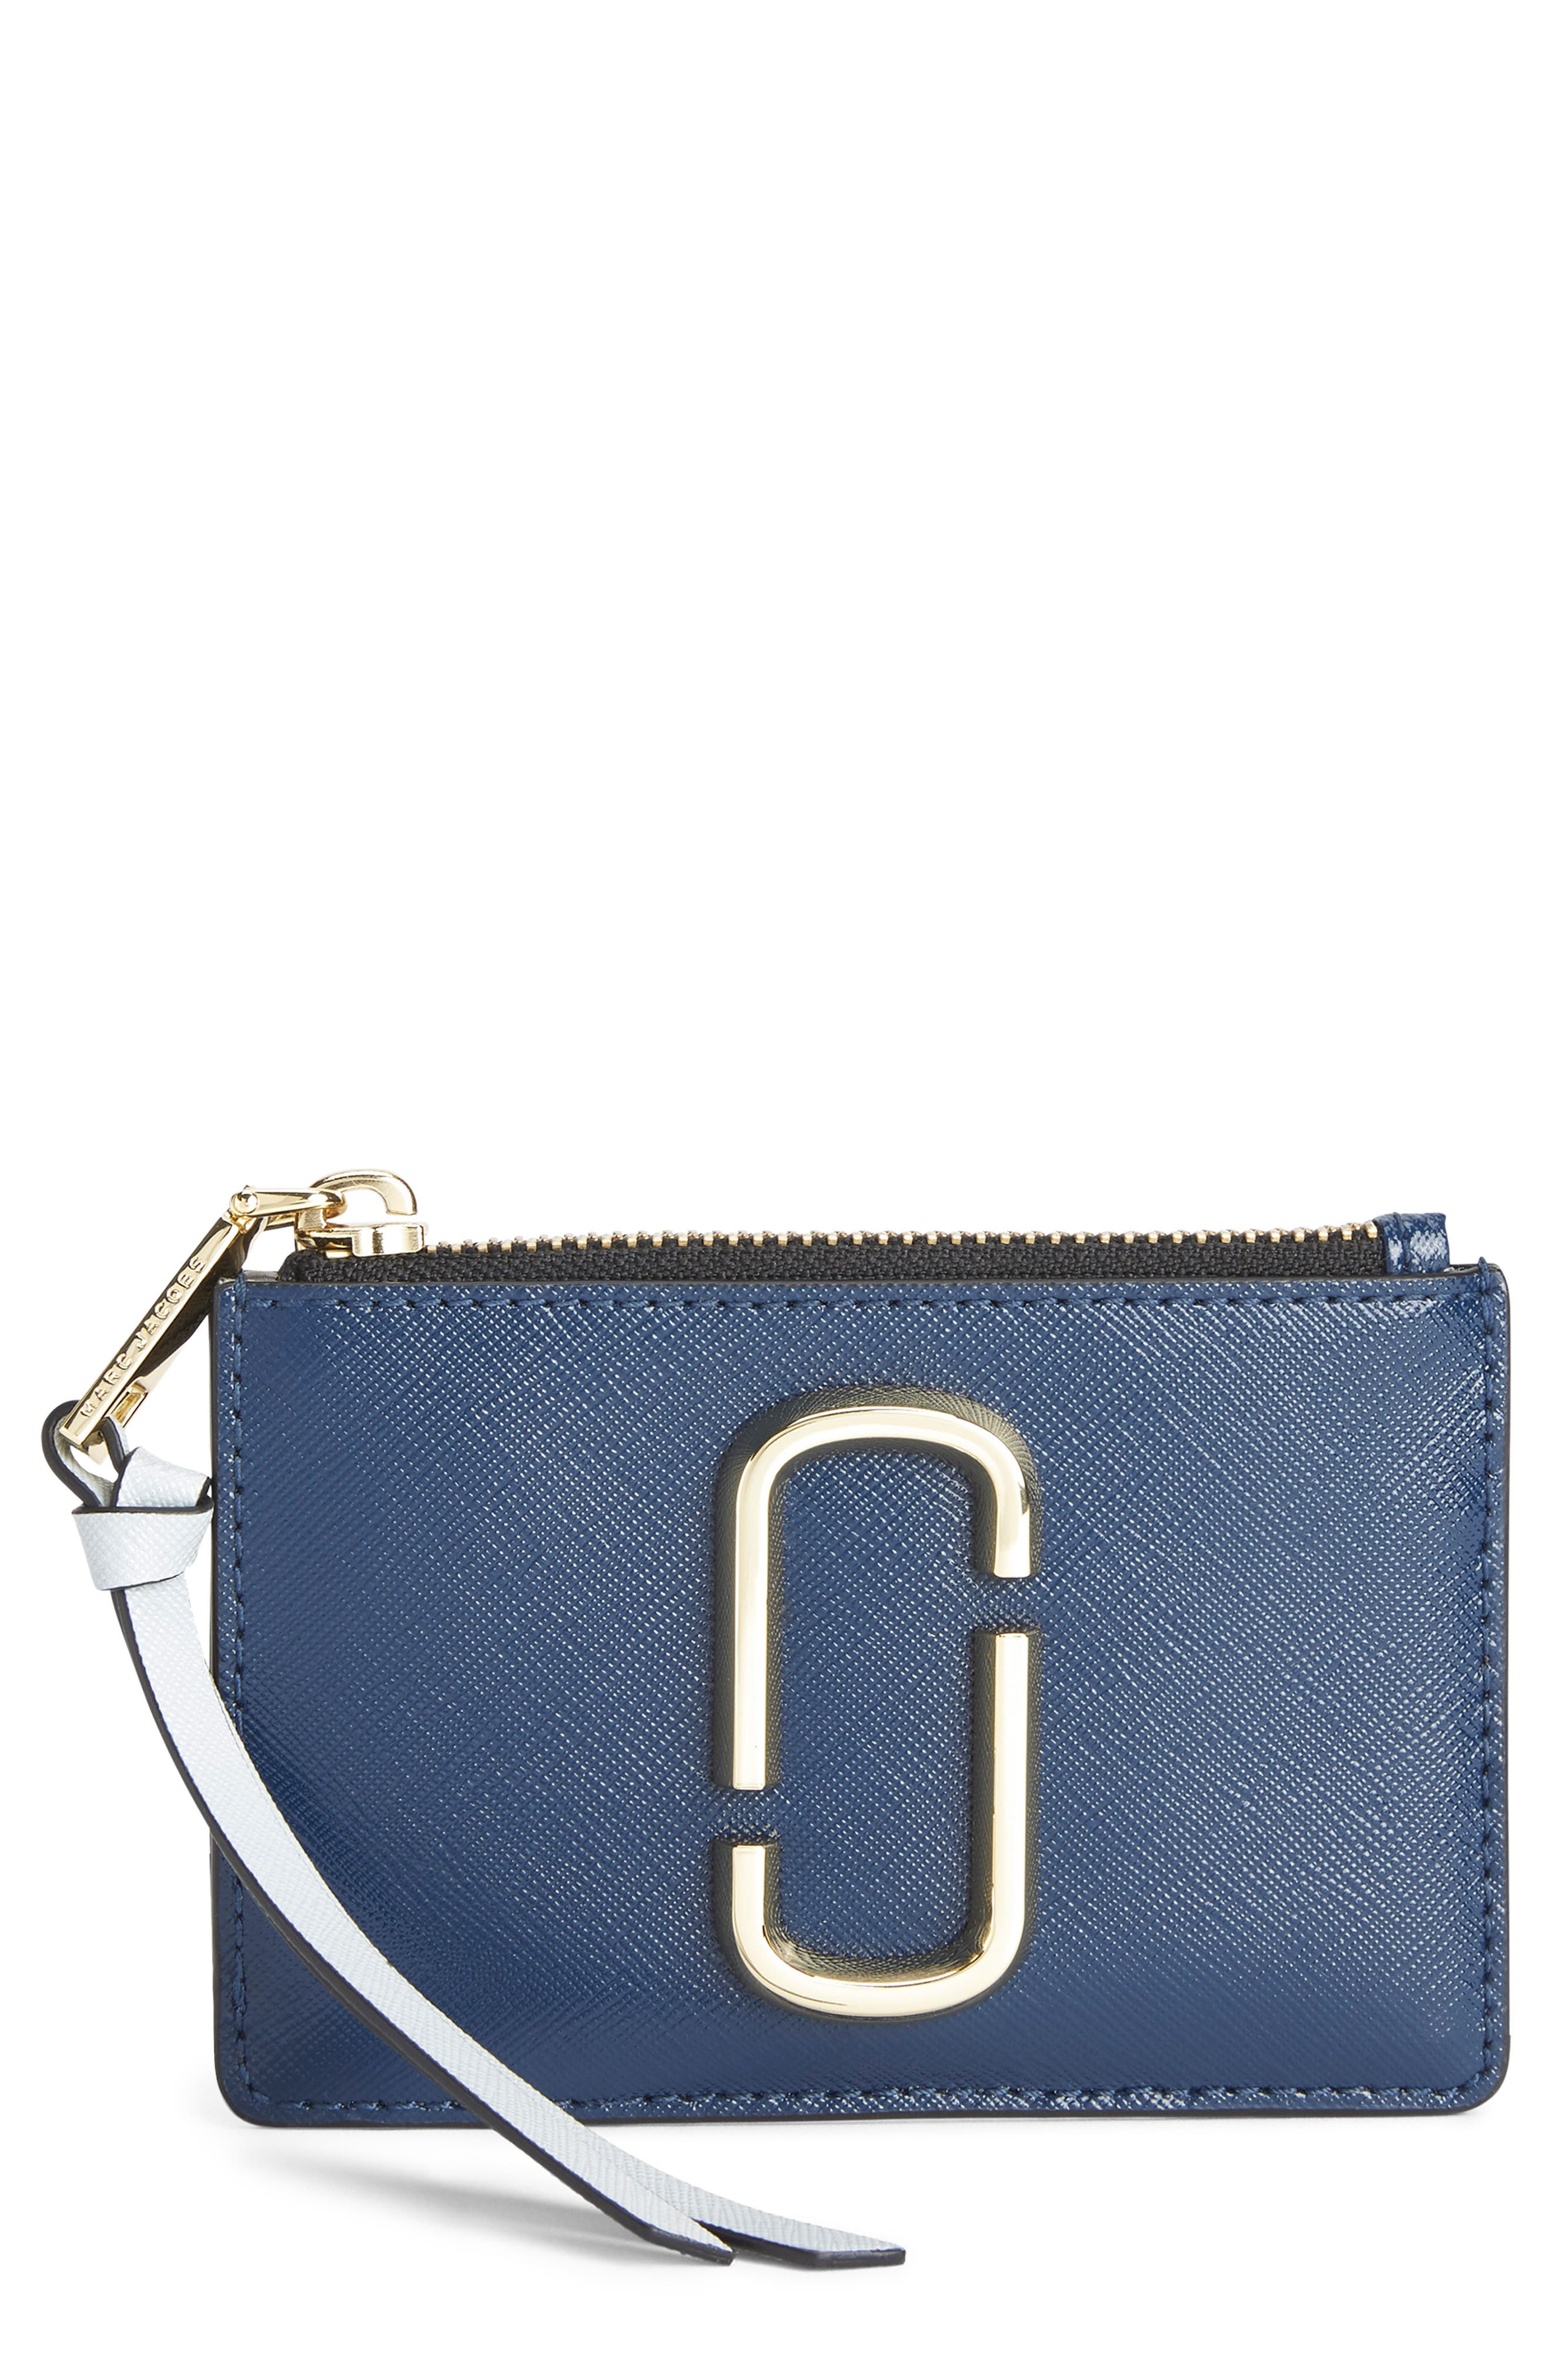 Snapshot Small Leather Wallet,                             Main thumbnail 1, color,                             BLUE SEA MULTI